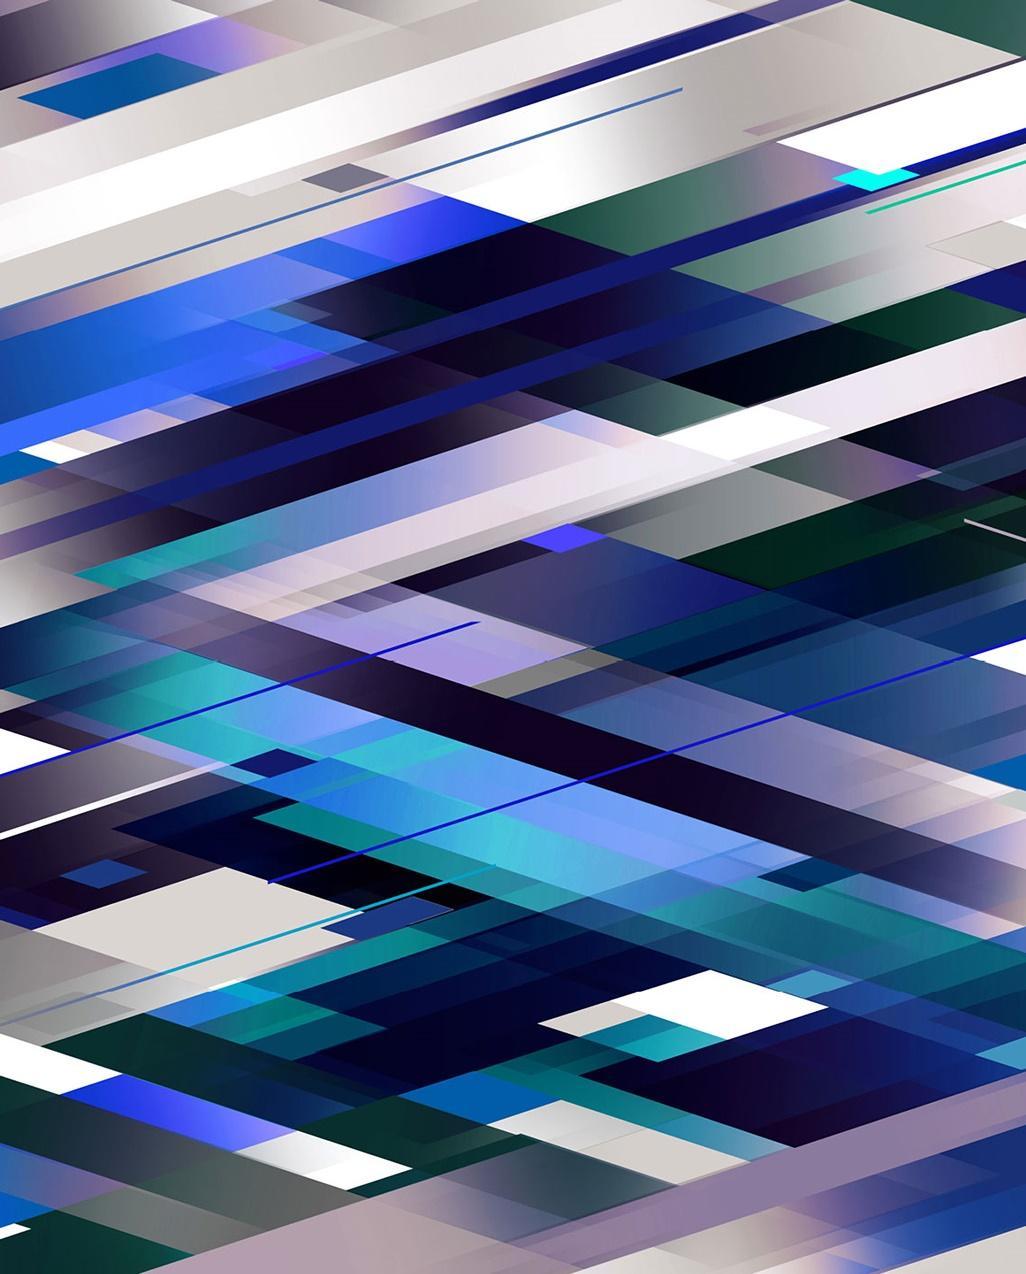 12._Diagonal_Gradient_Linen_Fabric